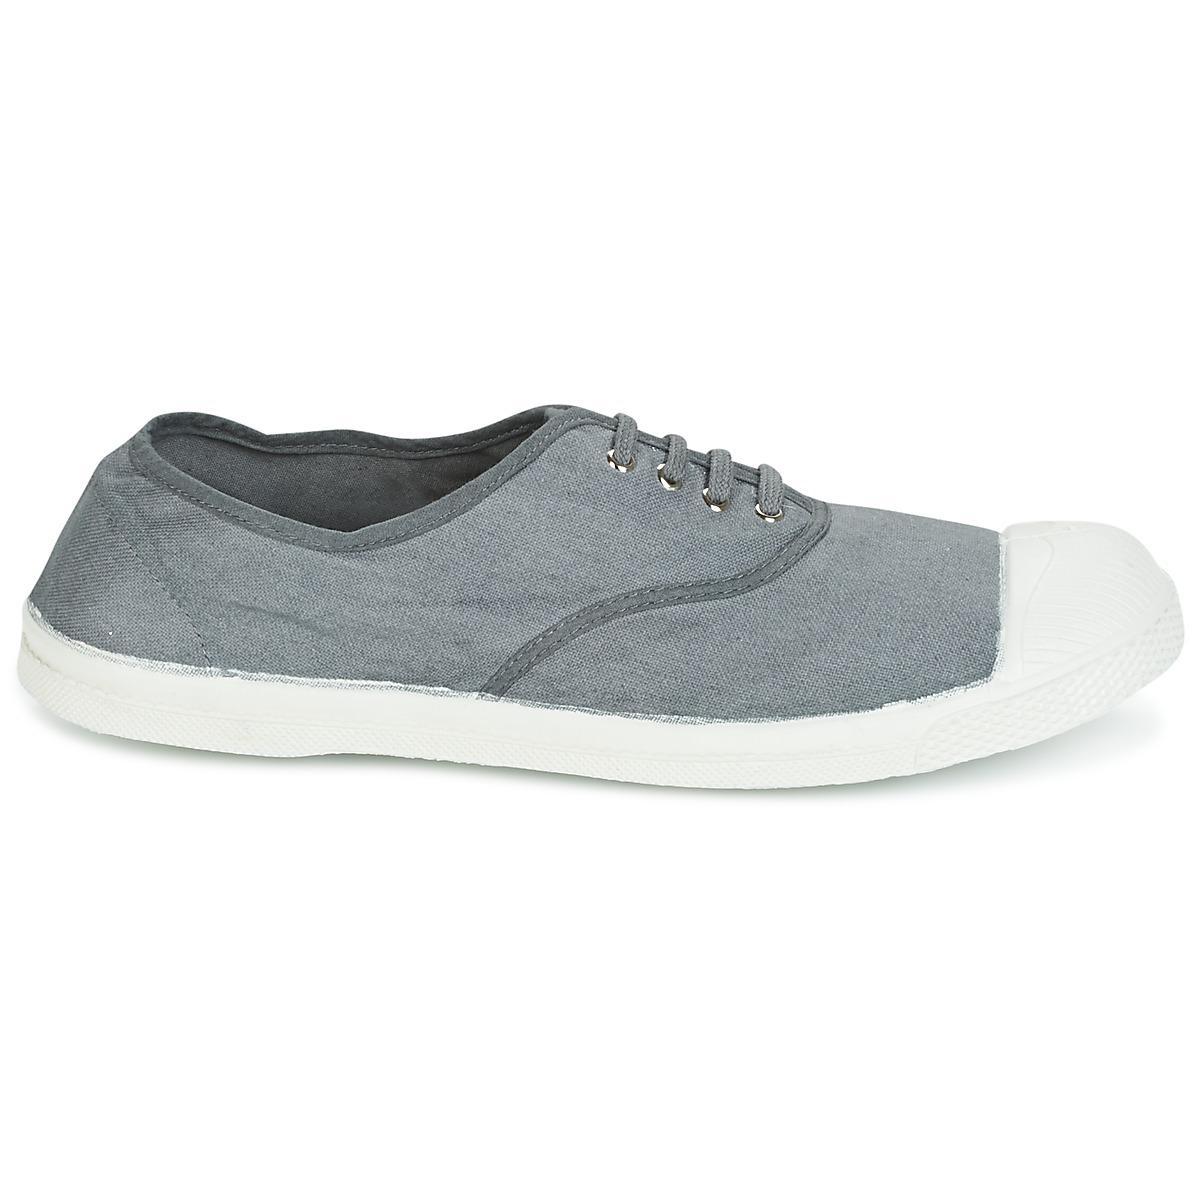 Chaussures Bensimon H15004C158516 zmNzsdUIY7